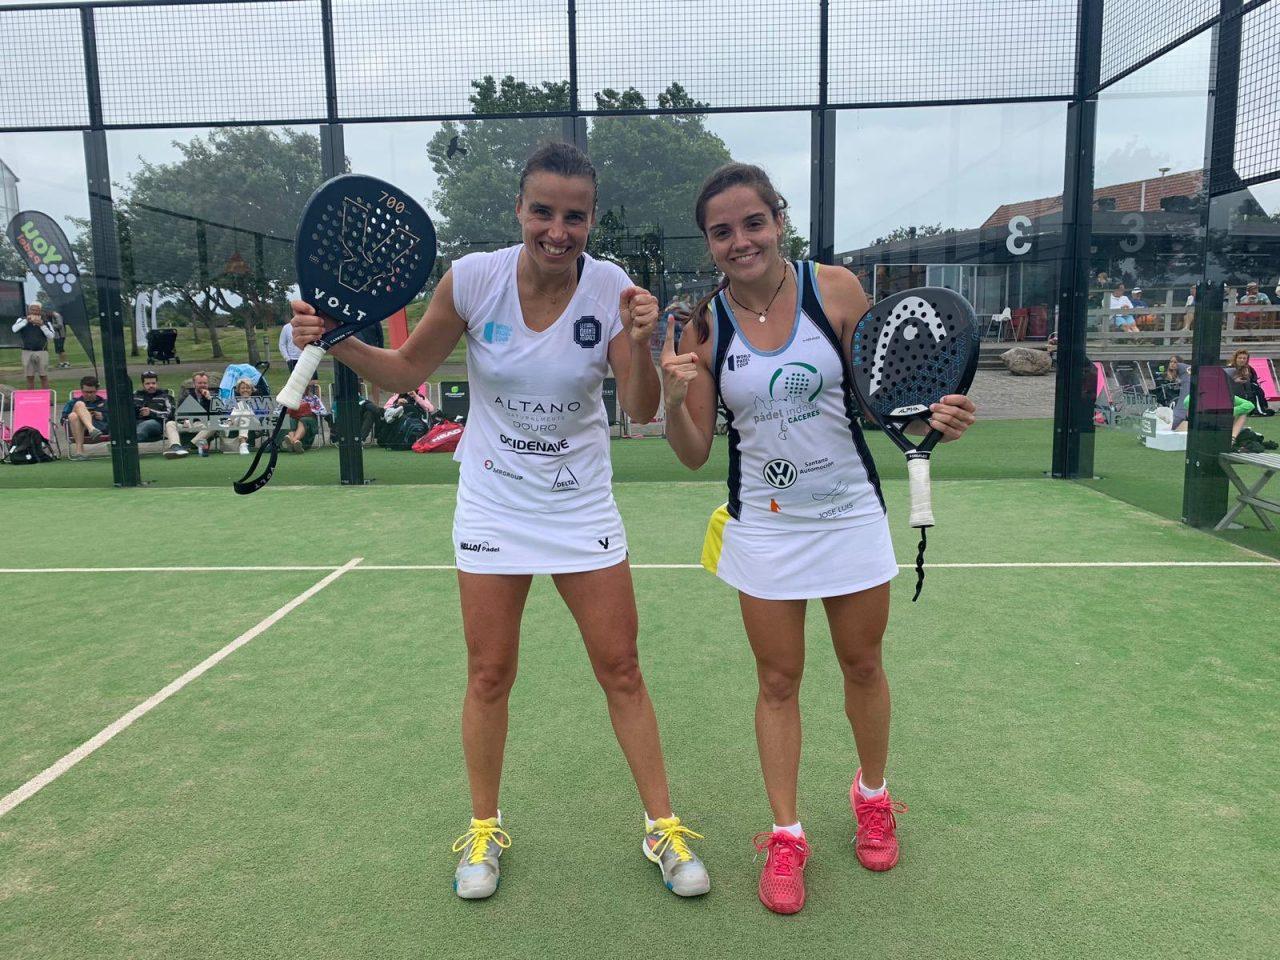 ana-catarina-nogueira-paula-josemaria-cuartos-femeninos-swedish-padel-open-2019